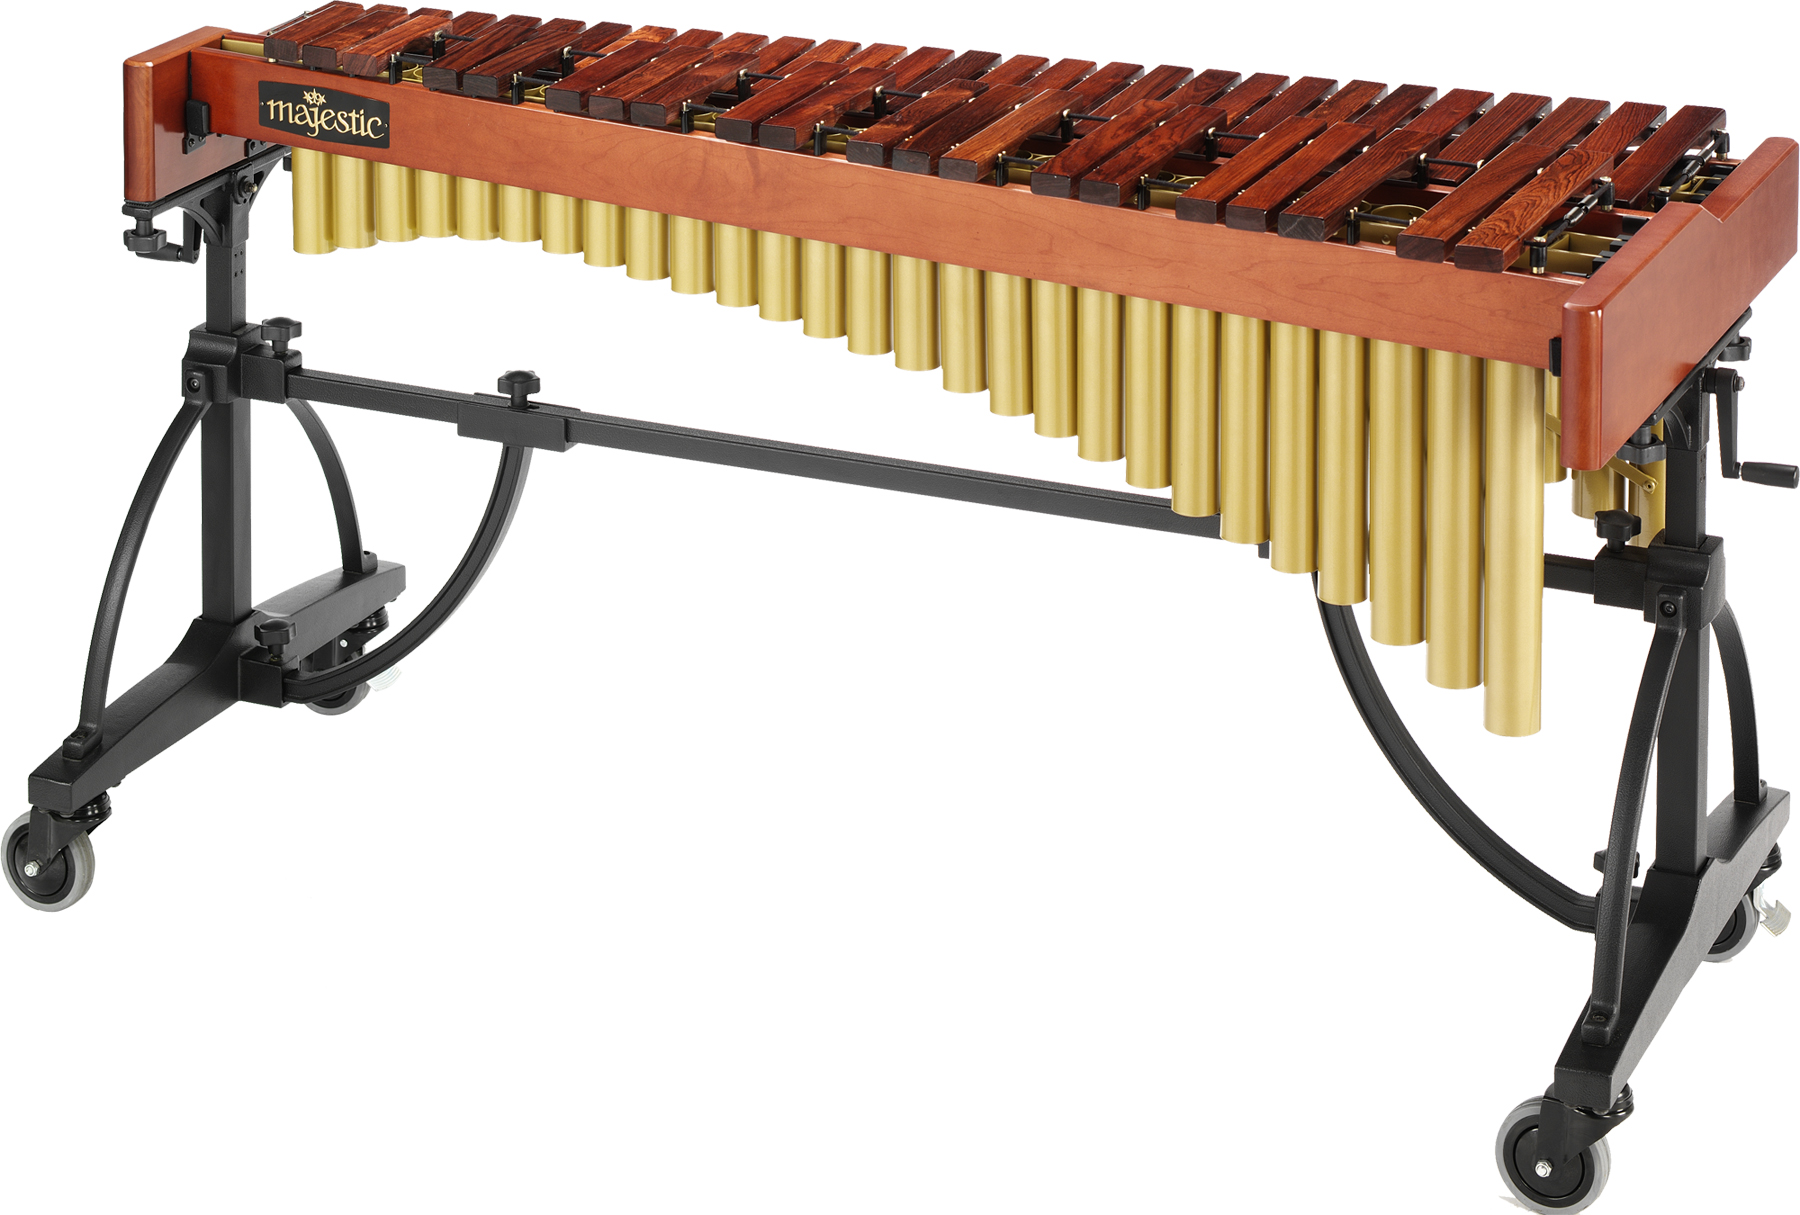 Care center instrumentsinstrument . Xylophone clipart percussion instrument